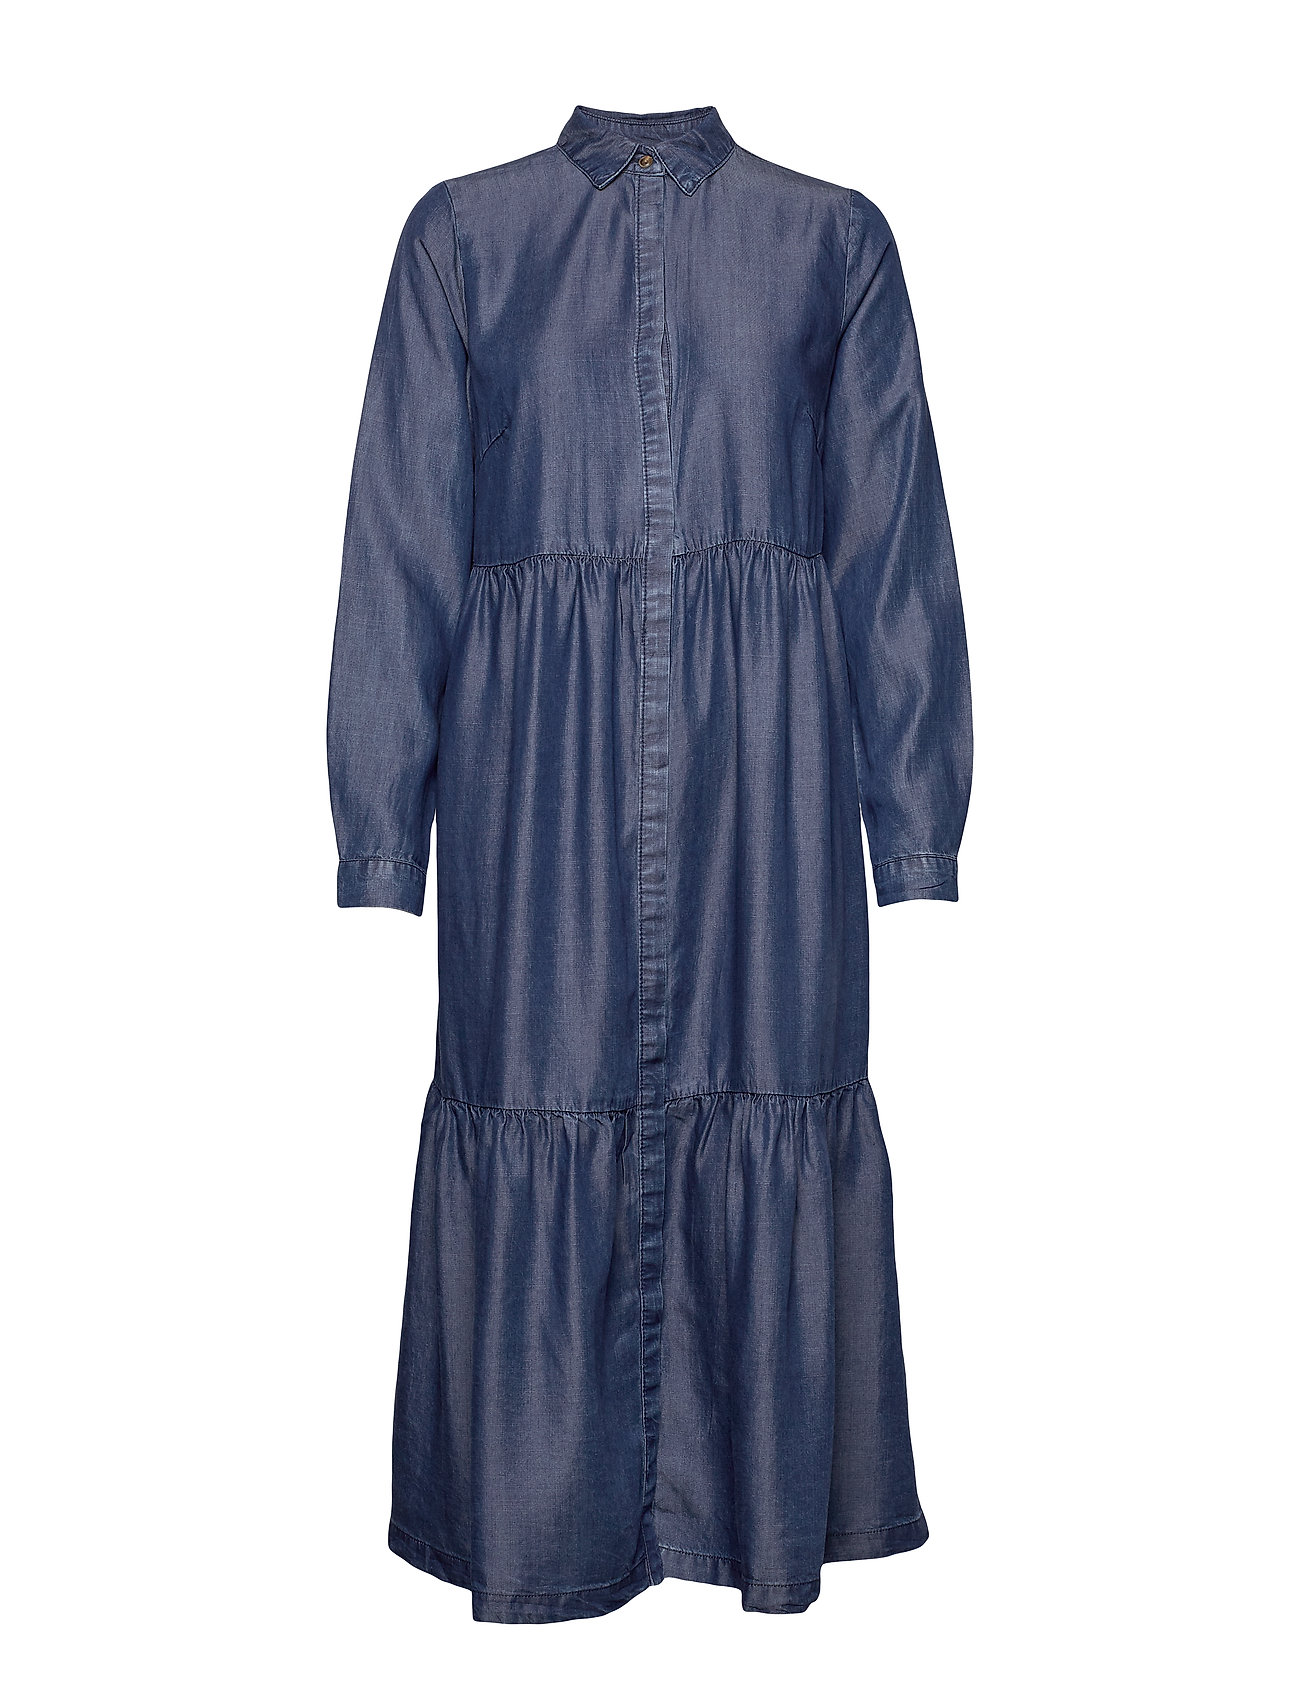 Pulz Jeans PZSNAKE Dress - MEDIUM BLUE DENIM